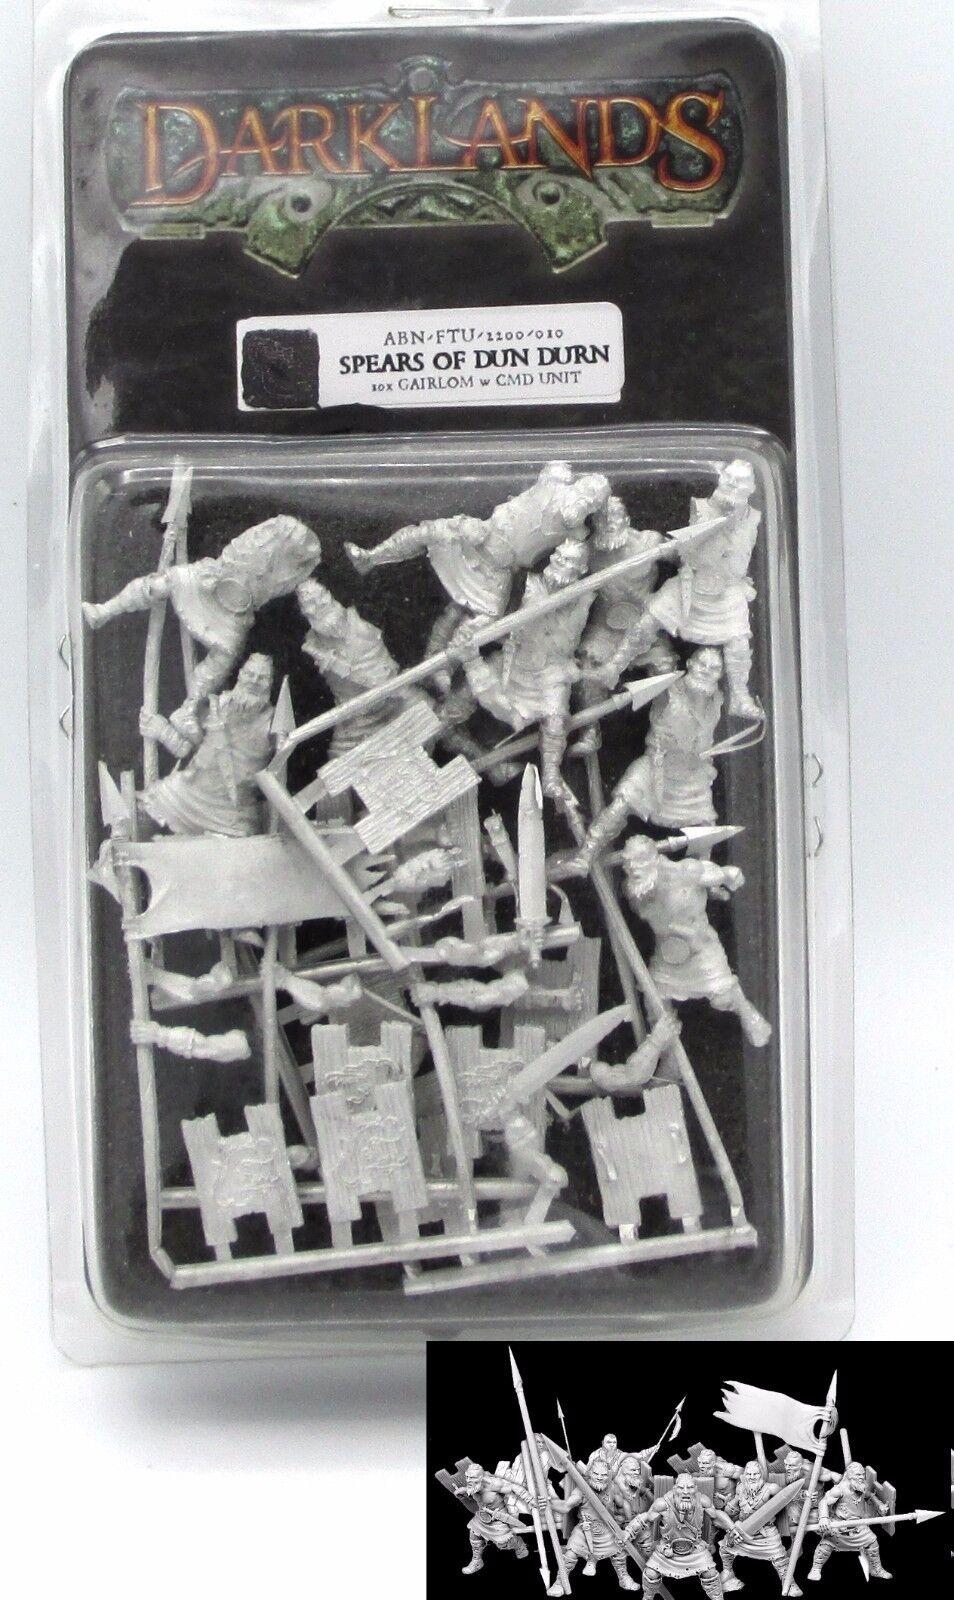 Darklands ABN-FTU-2200--010 Spears of Dun Durn Gairlom Unit 10x Warriors Command